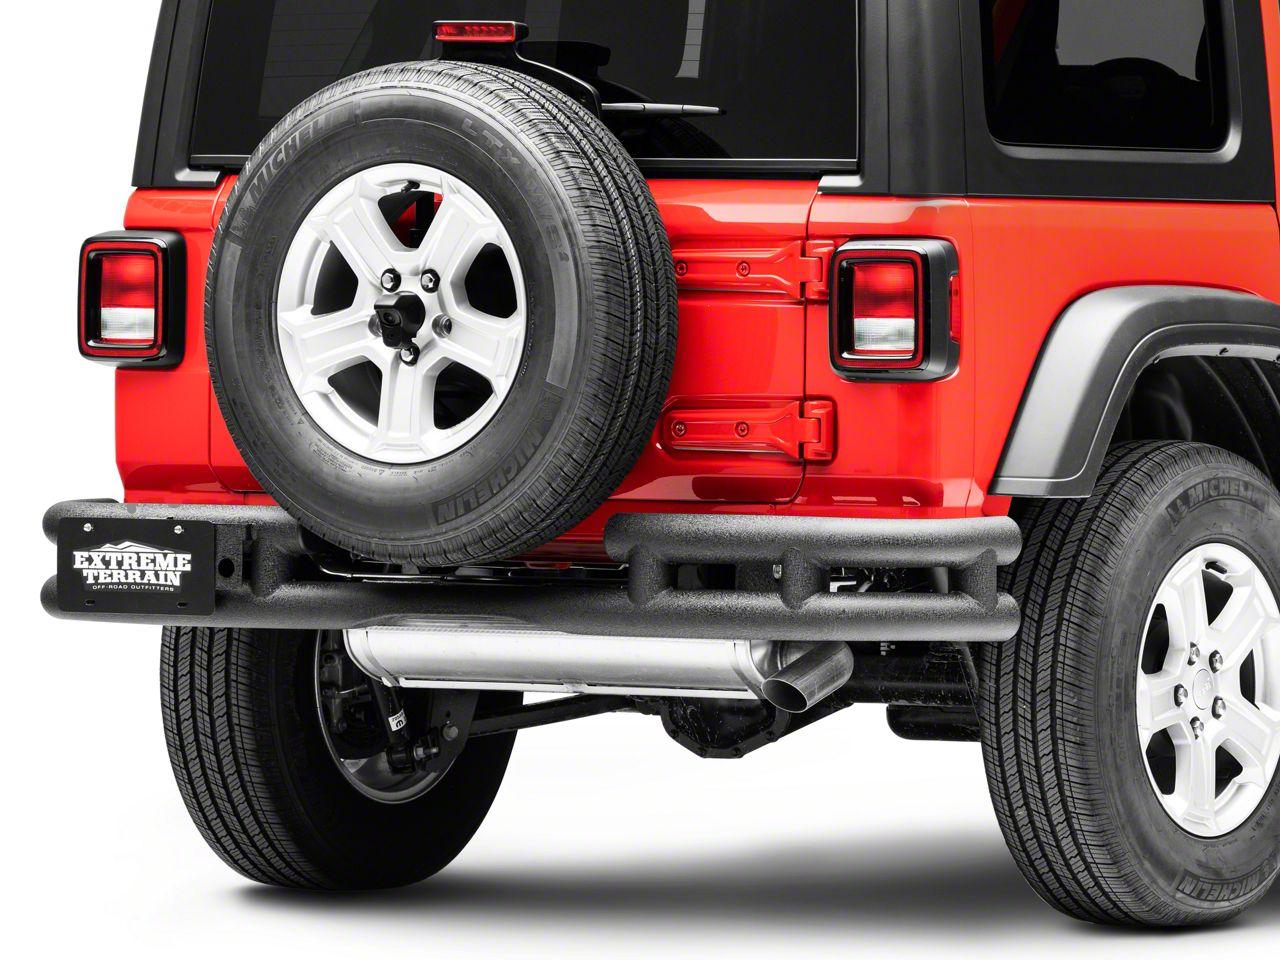 RedRock 4x4 Tubular Rear Bumper w/ Wrap Around - Textured Black (2018 Jeep Wrangler JL)